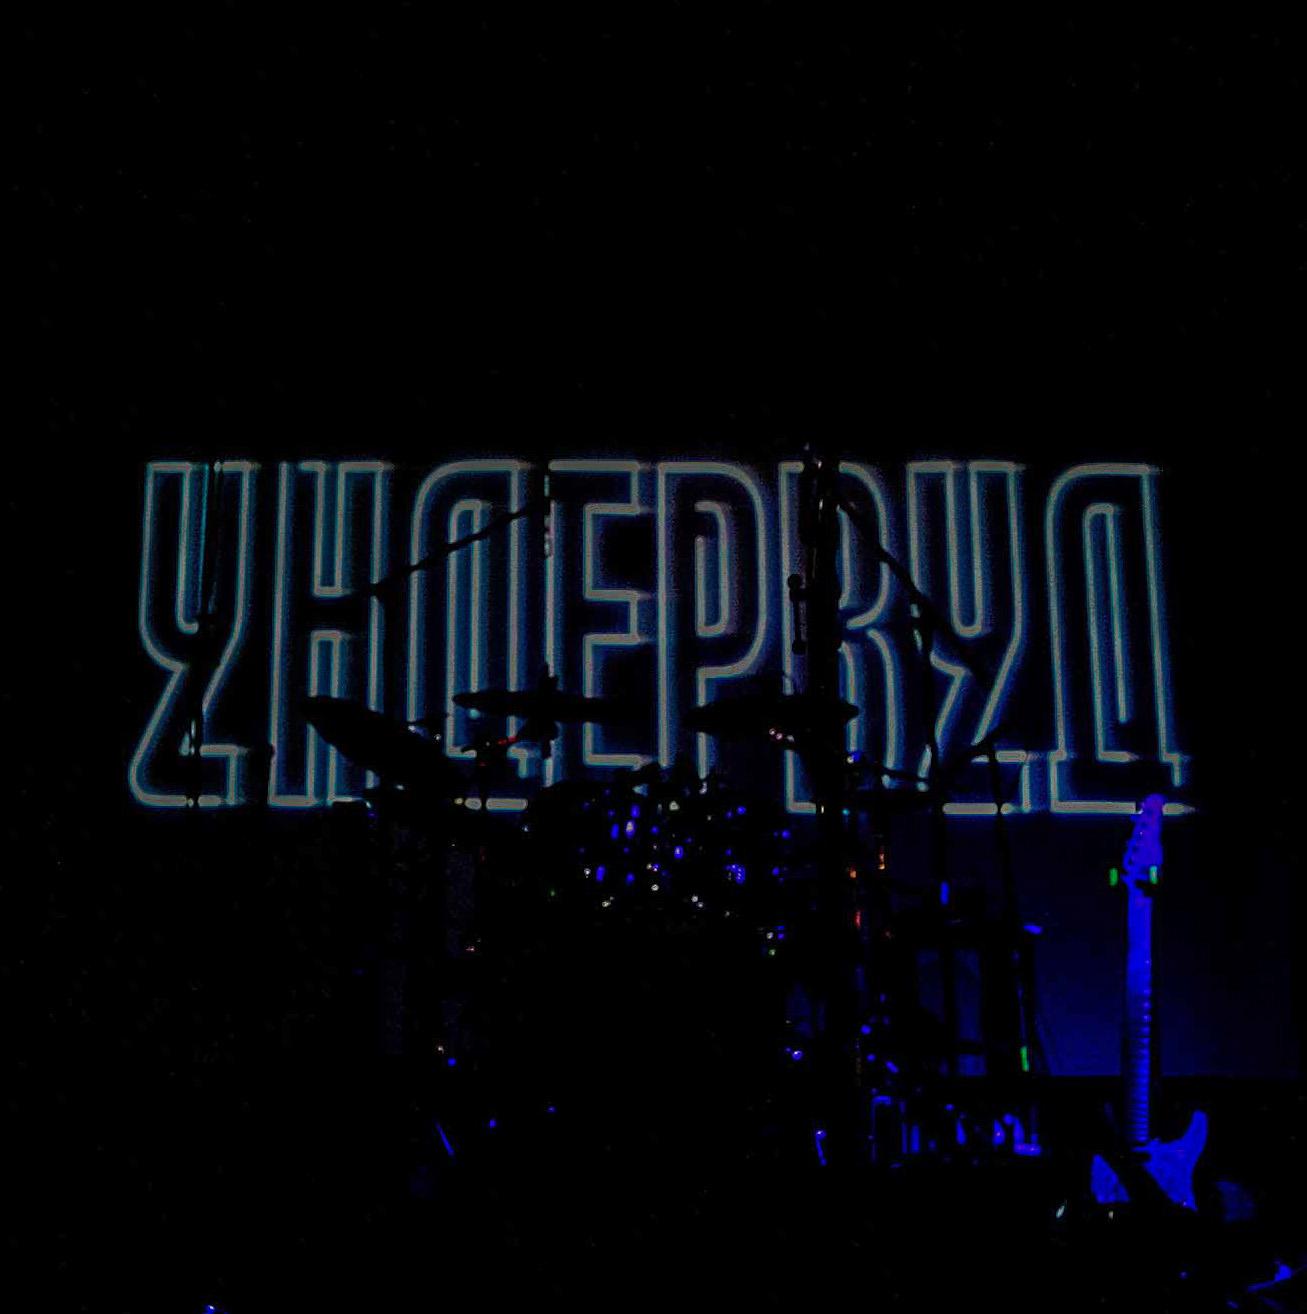 10.12.2016, Петербург, Космонавт. Ундервуду - 21!